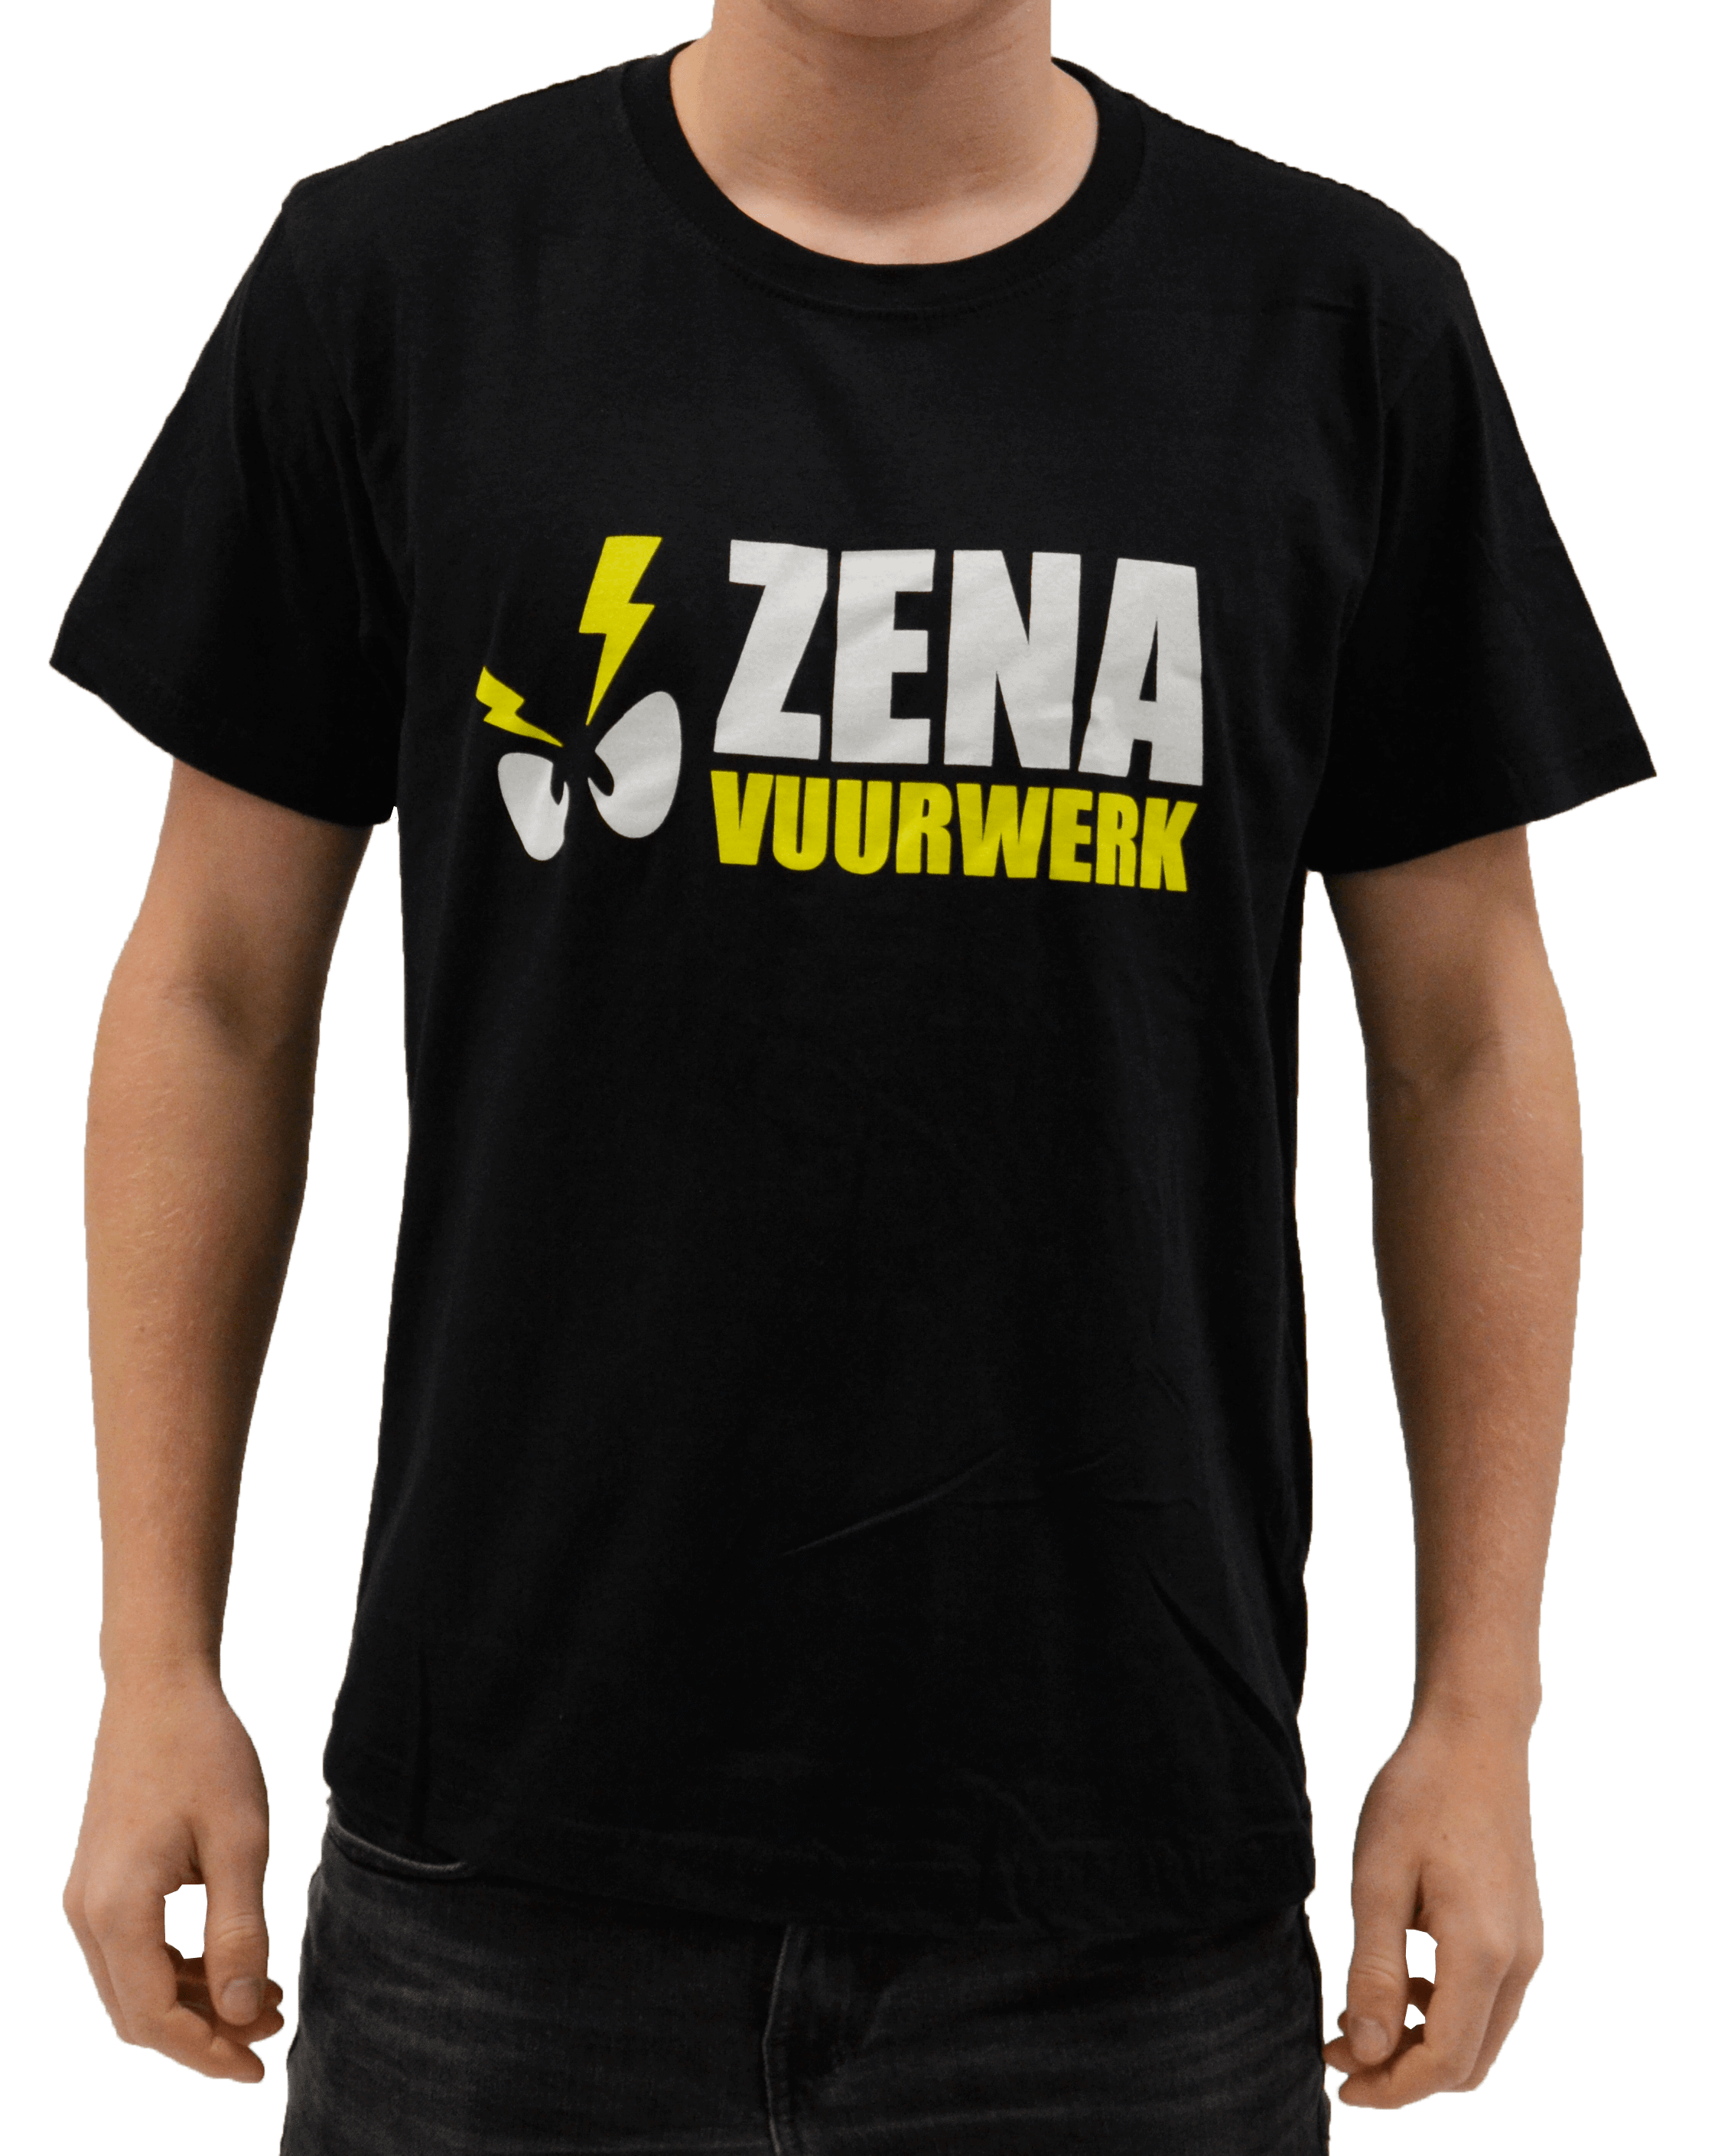 Zena T-Shirt Maat M